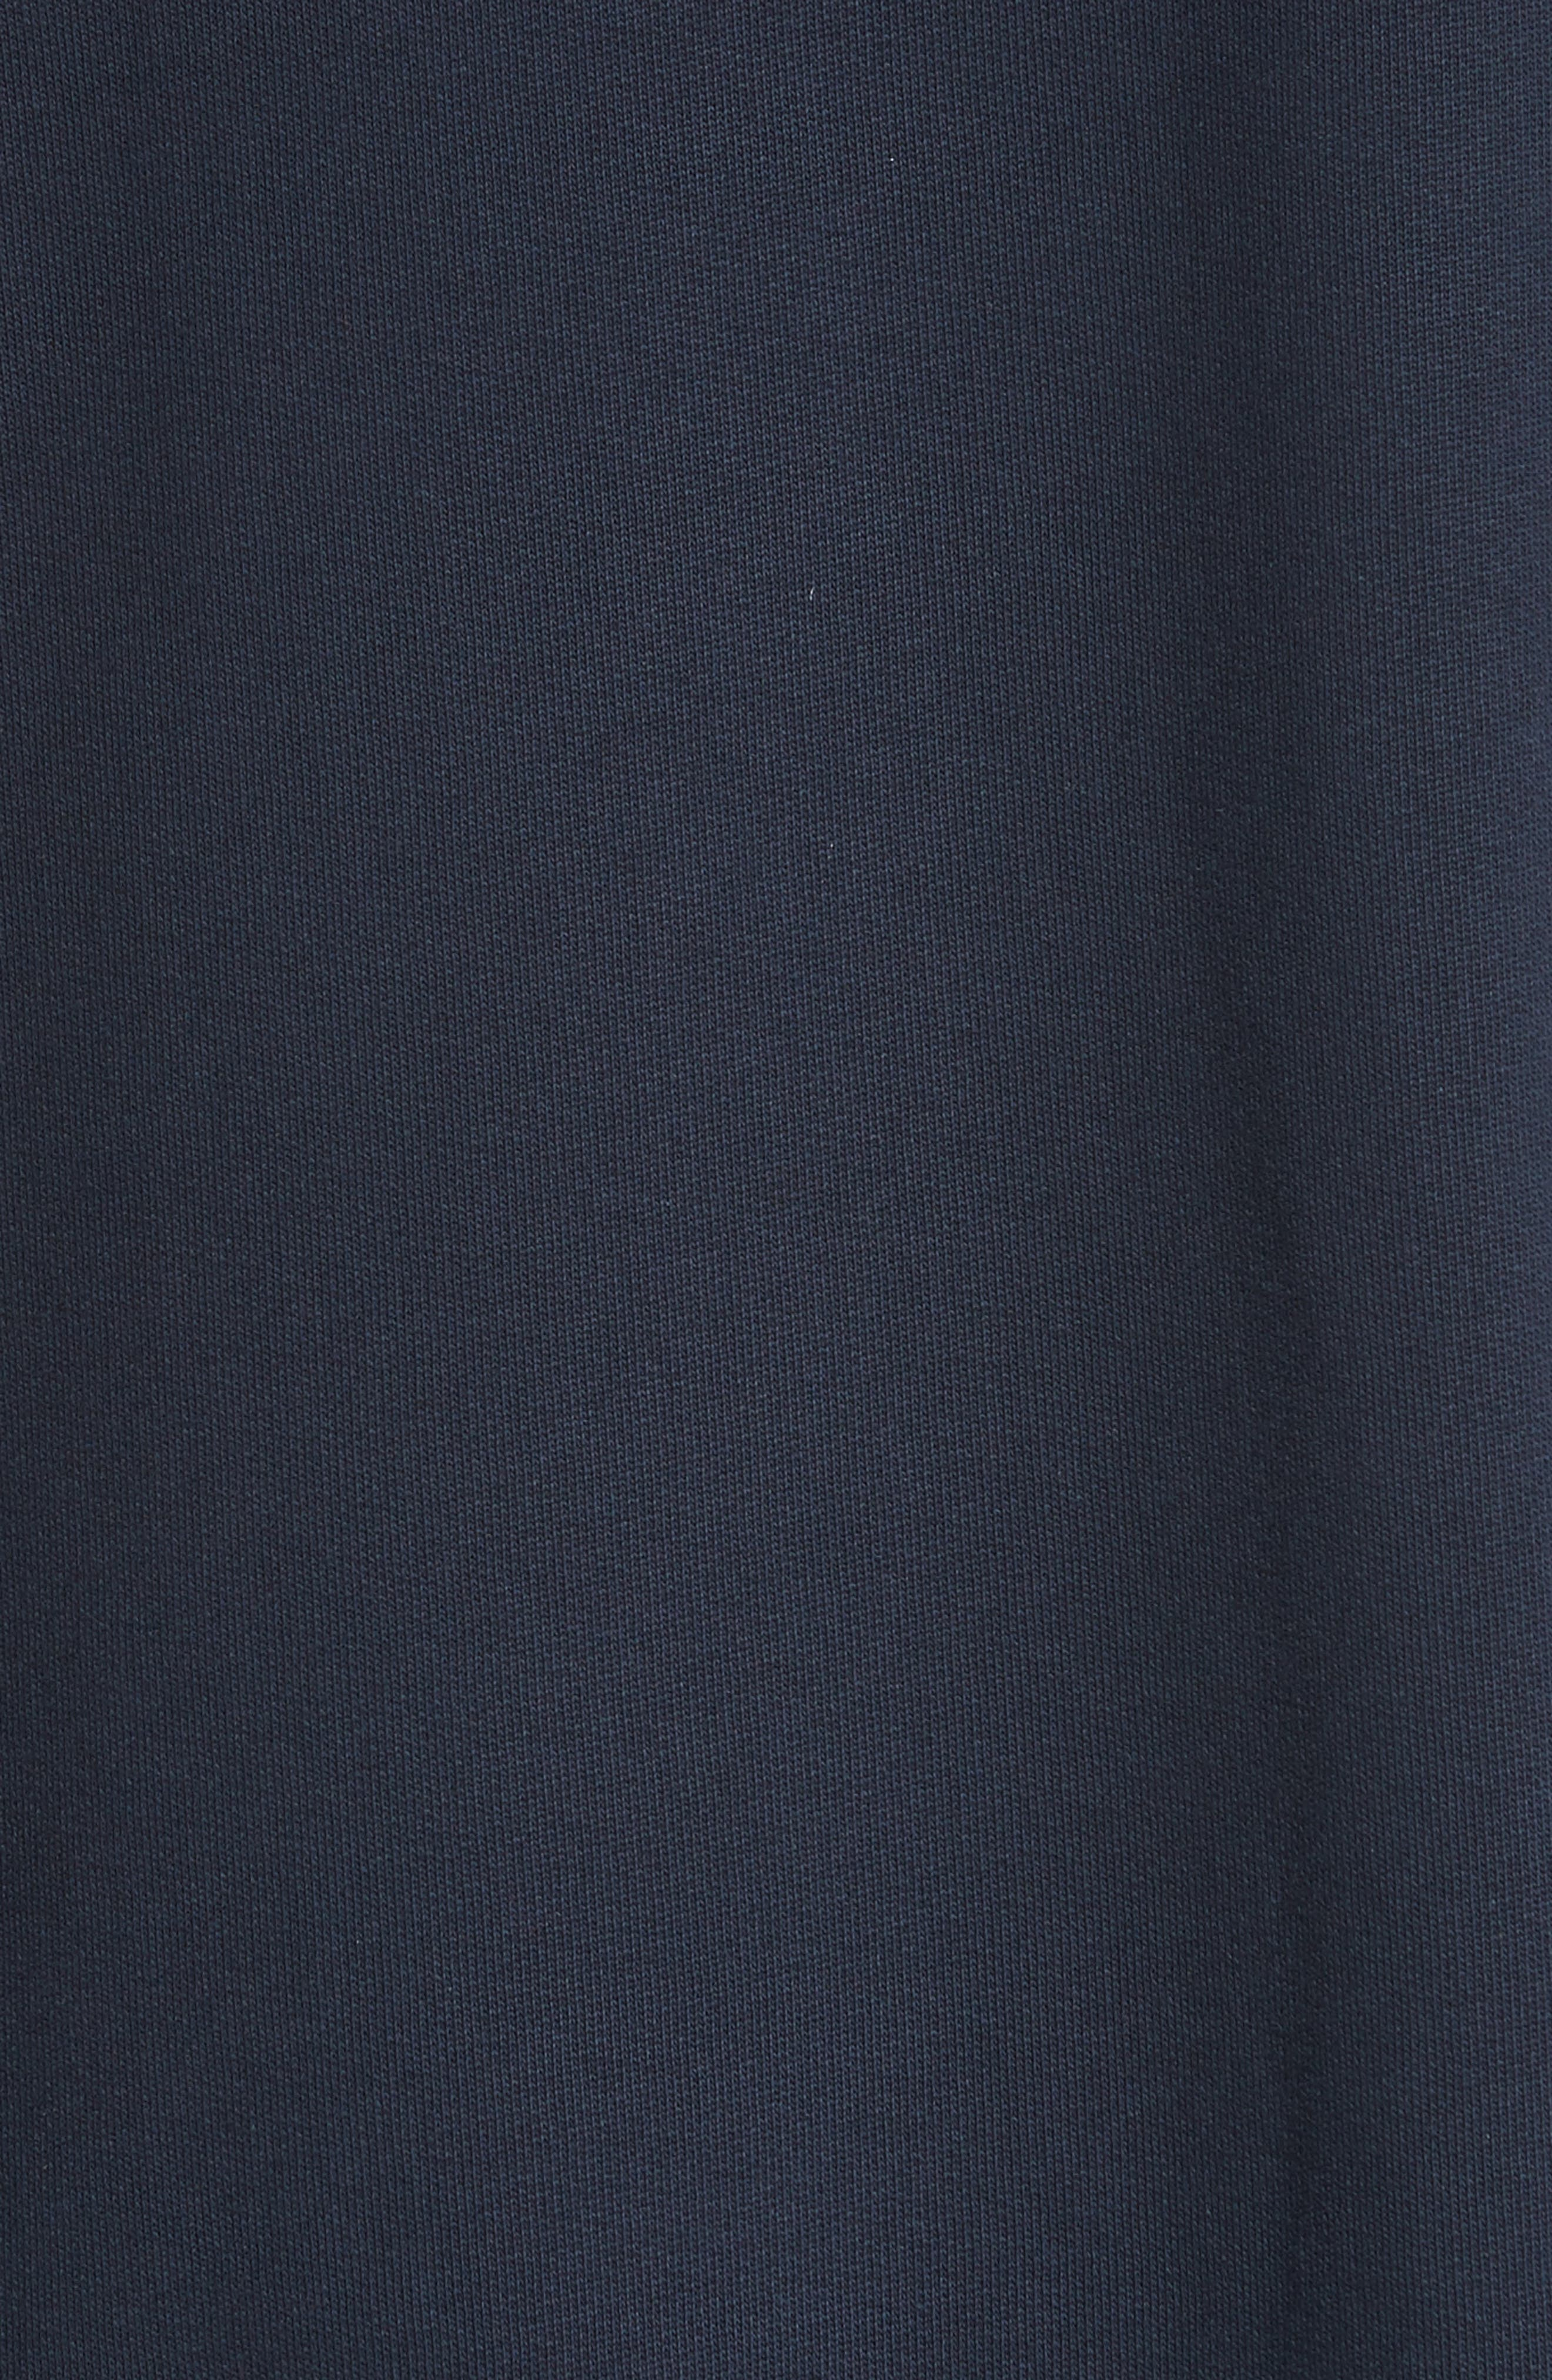 Sweatshirt Dress,                             Alternate thumbnail 6, color,                             Navy